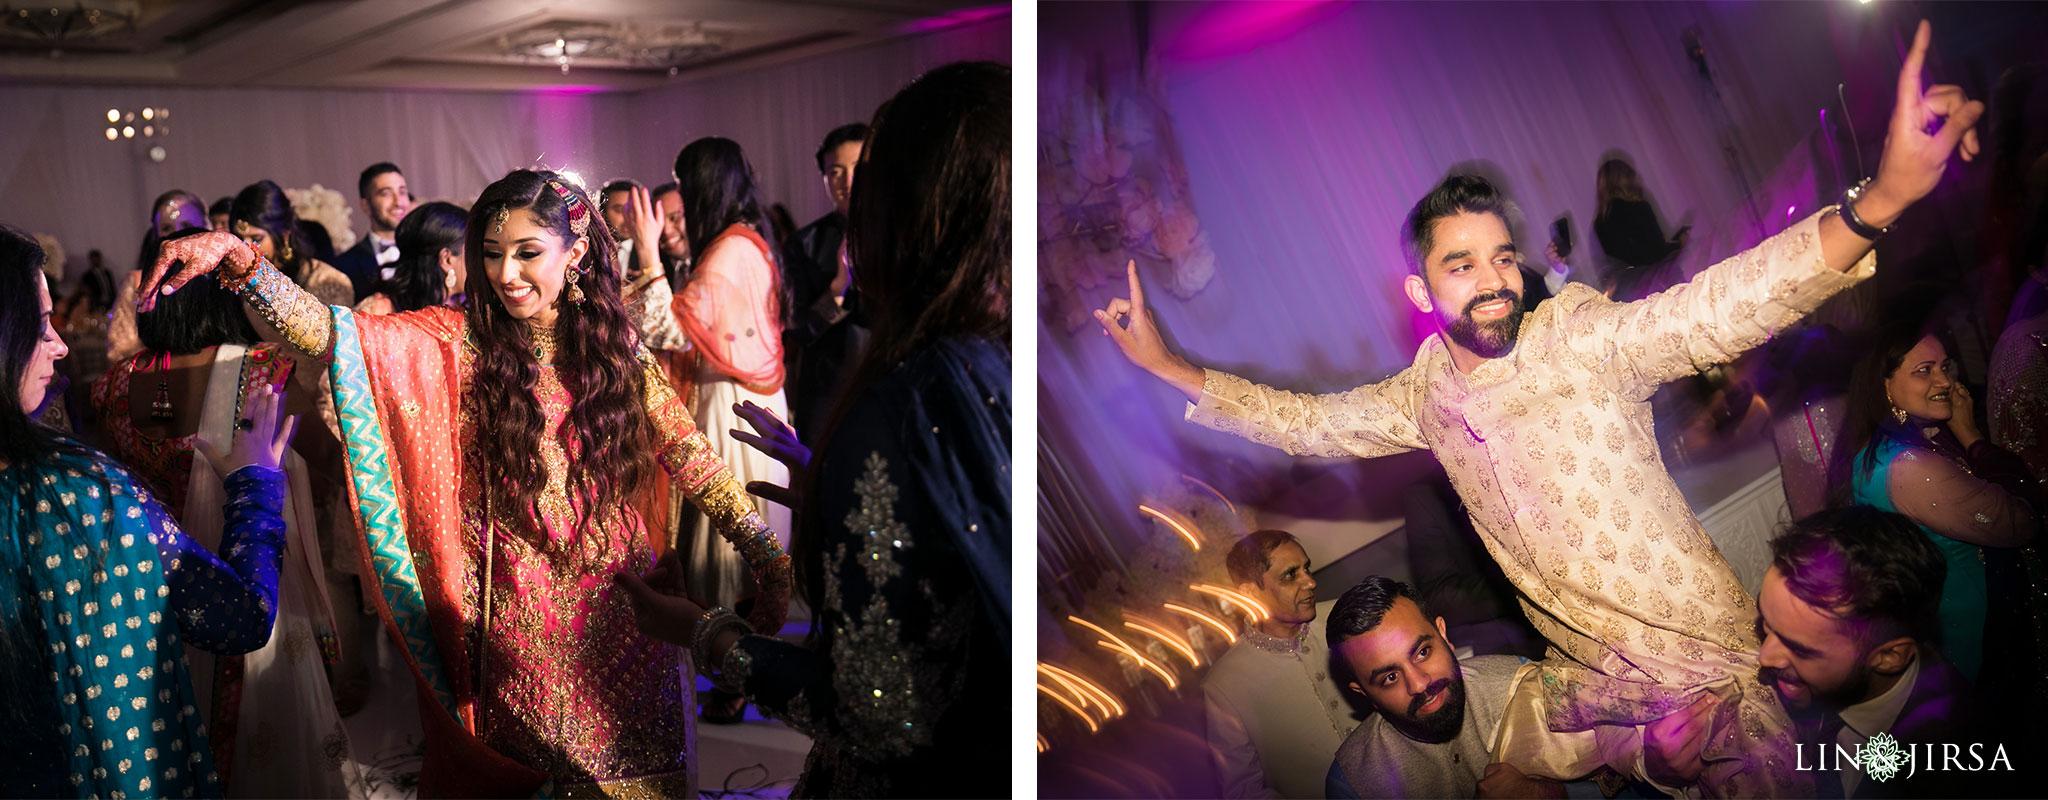 50 laguna cliffs marriott muslim wedding reception photography